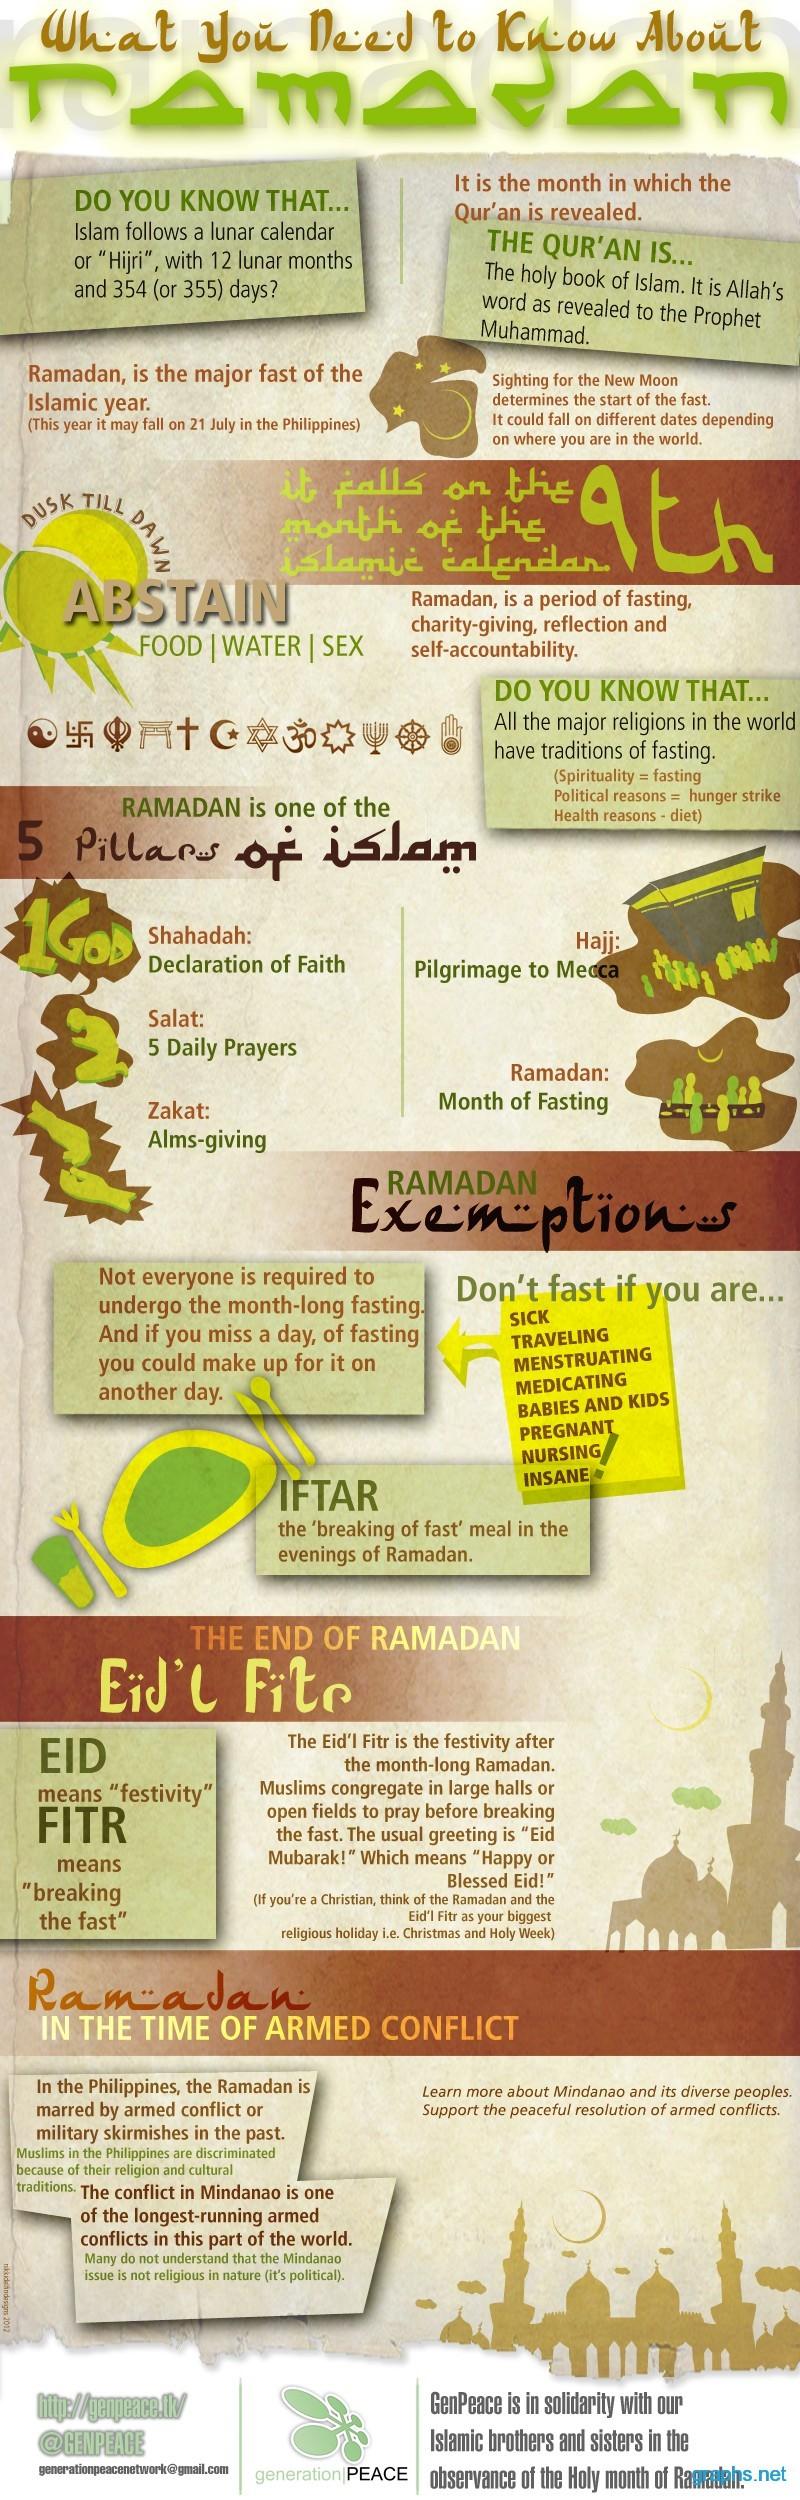 Information on Ramadan